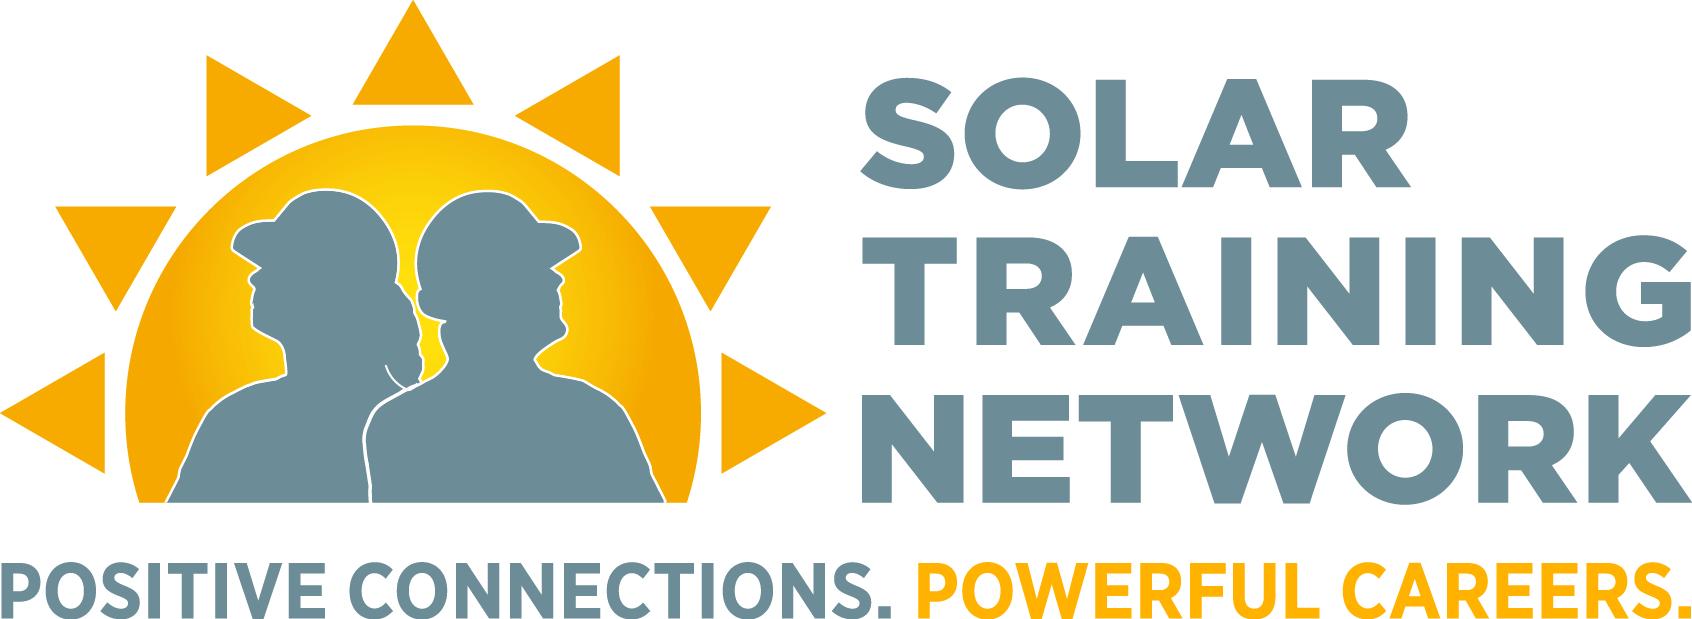 The Solar Training Network logo